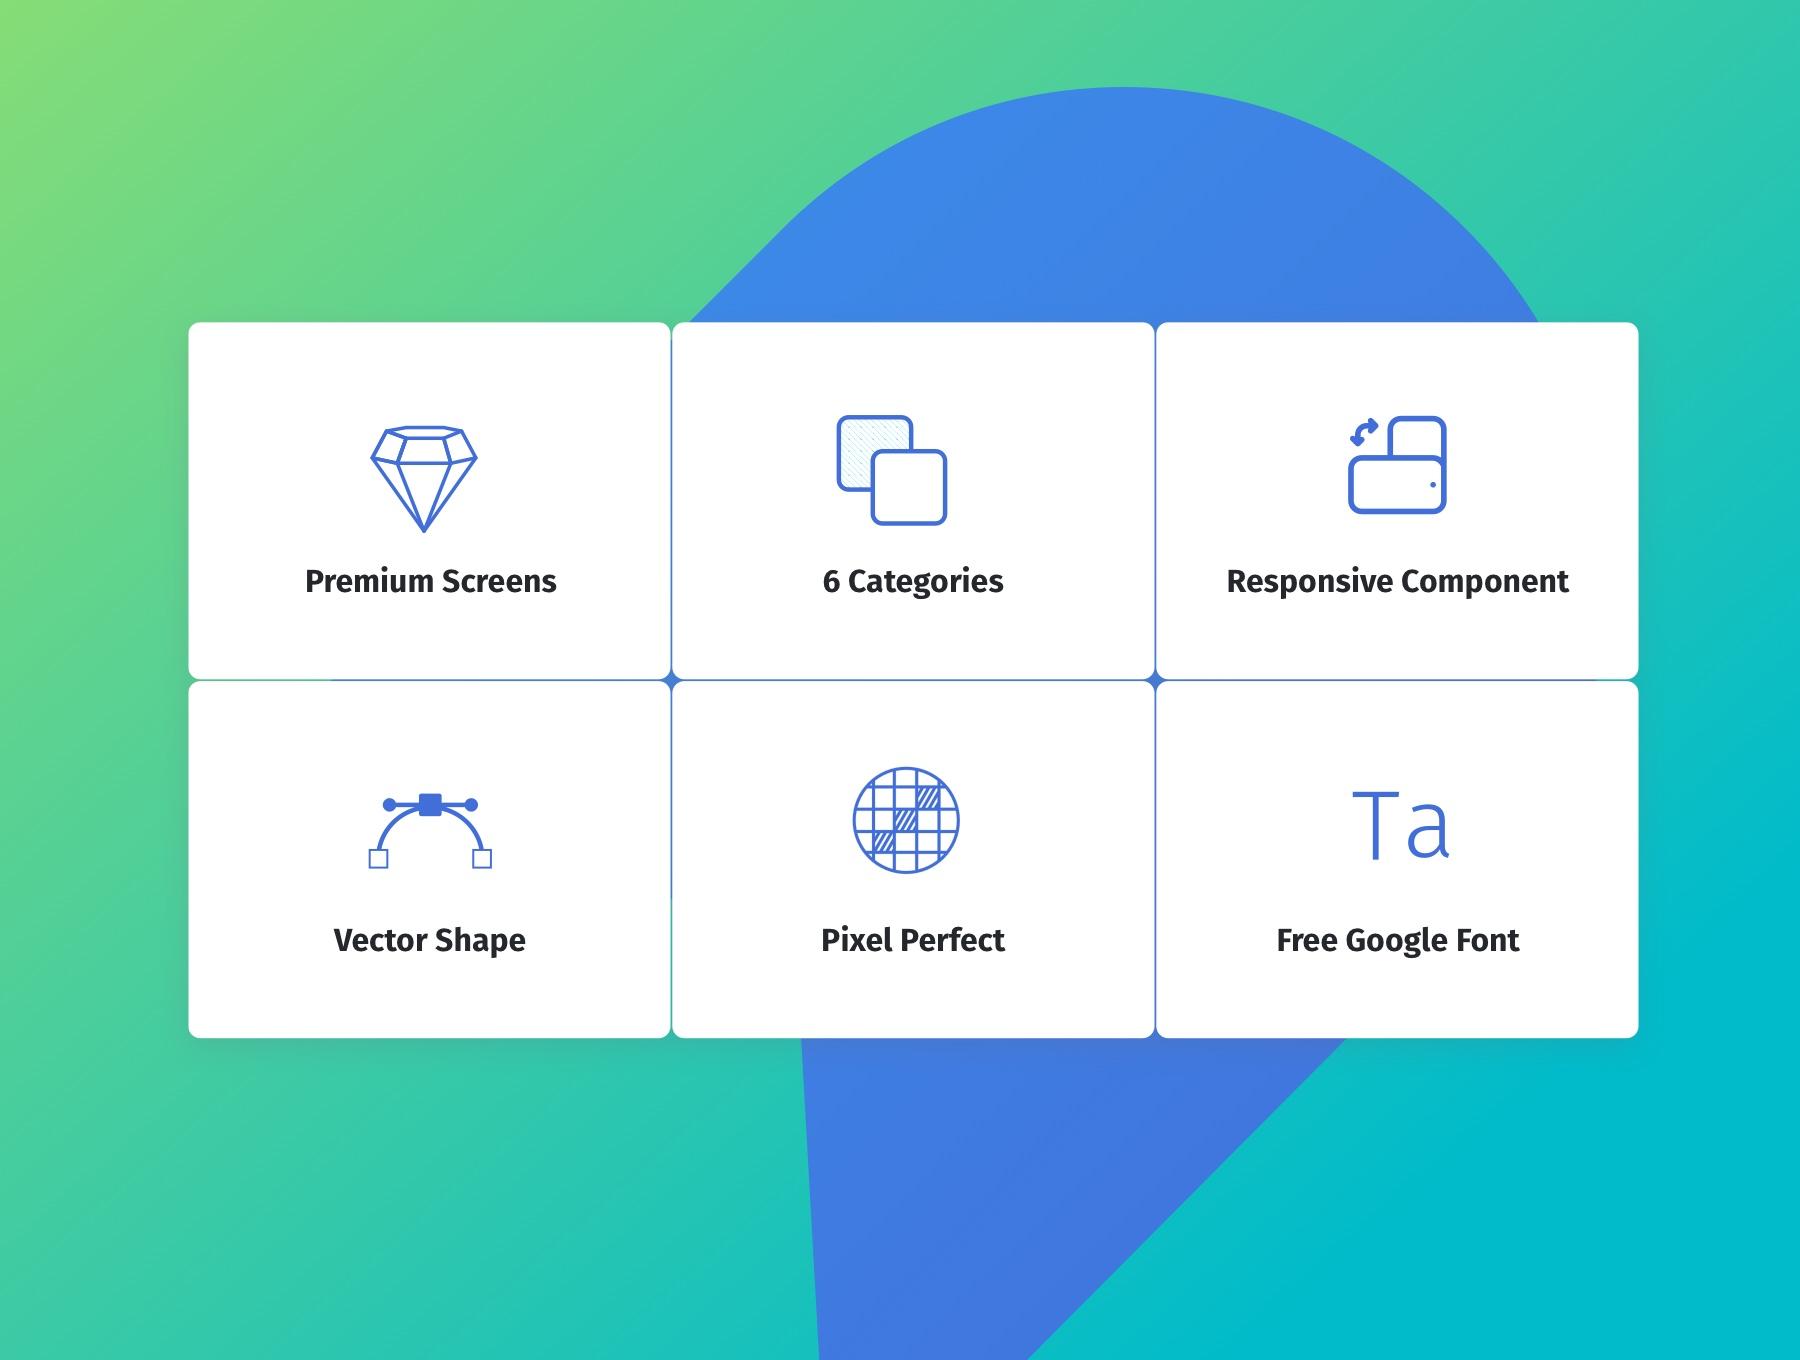 咖啡店酒店餐馆食品外卖APP应用程序UI界面设计套件 YumFood – Mobile App UI kit插图(2)